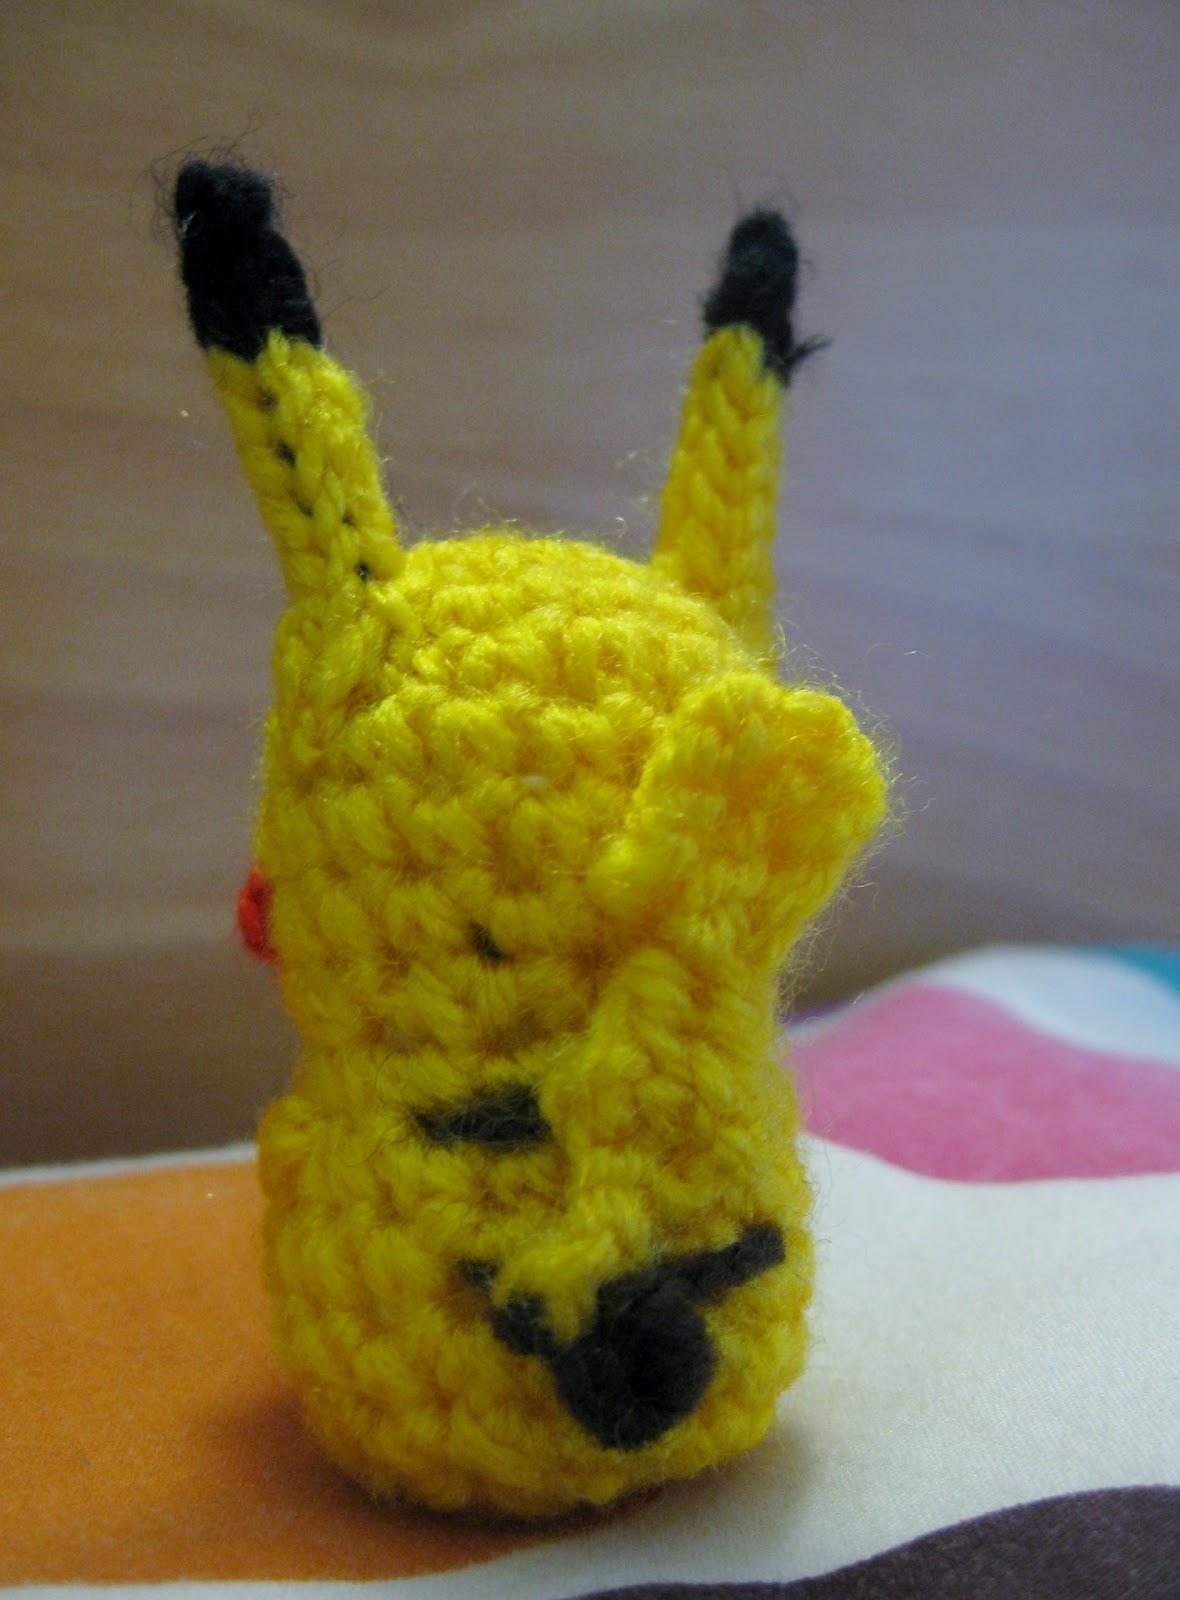 Crafty Mutt: How to make a tiny crochet pikachu tail